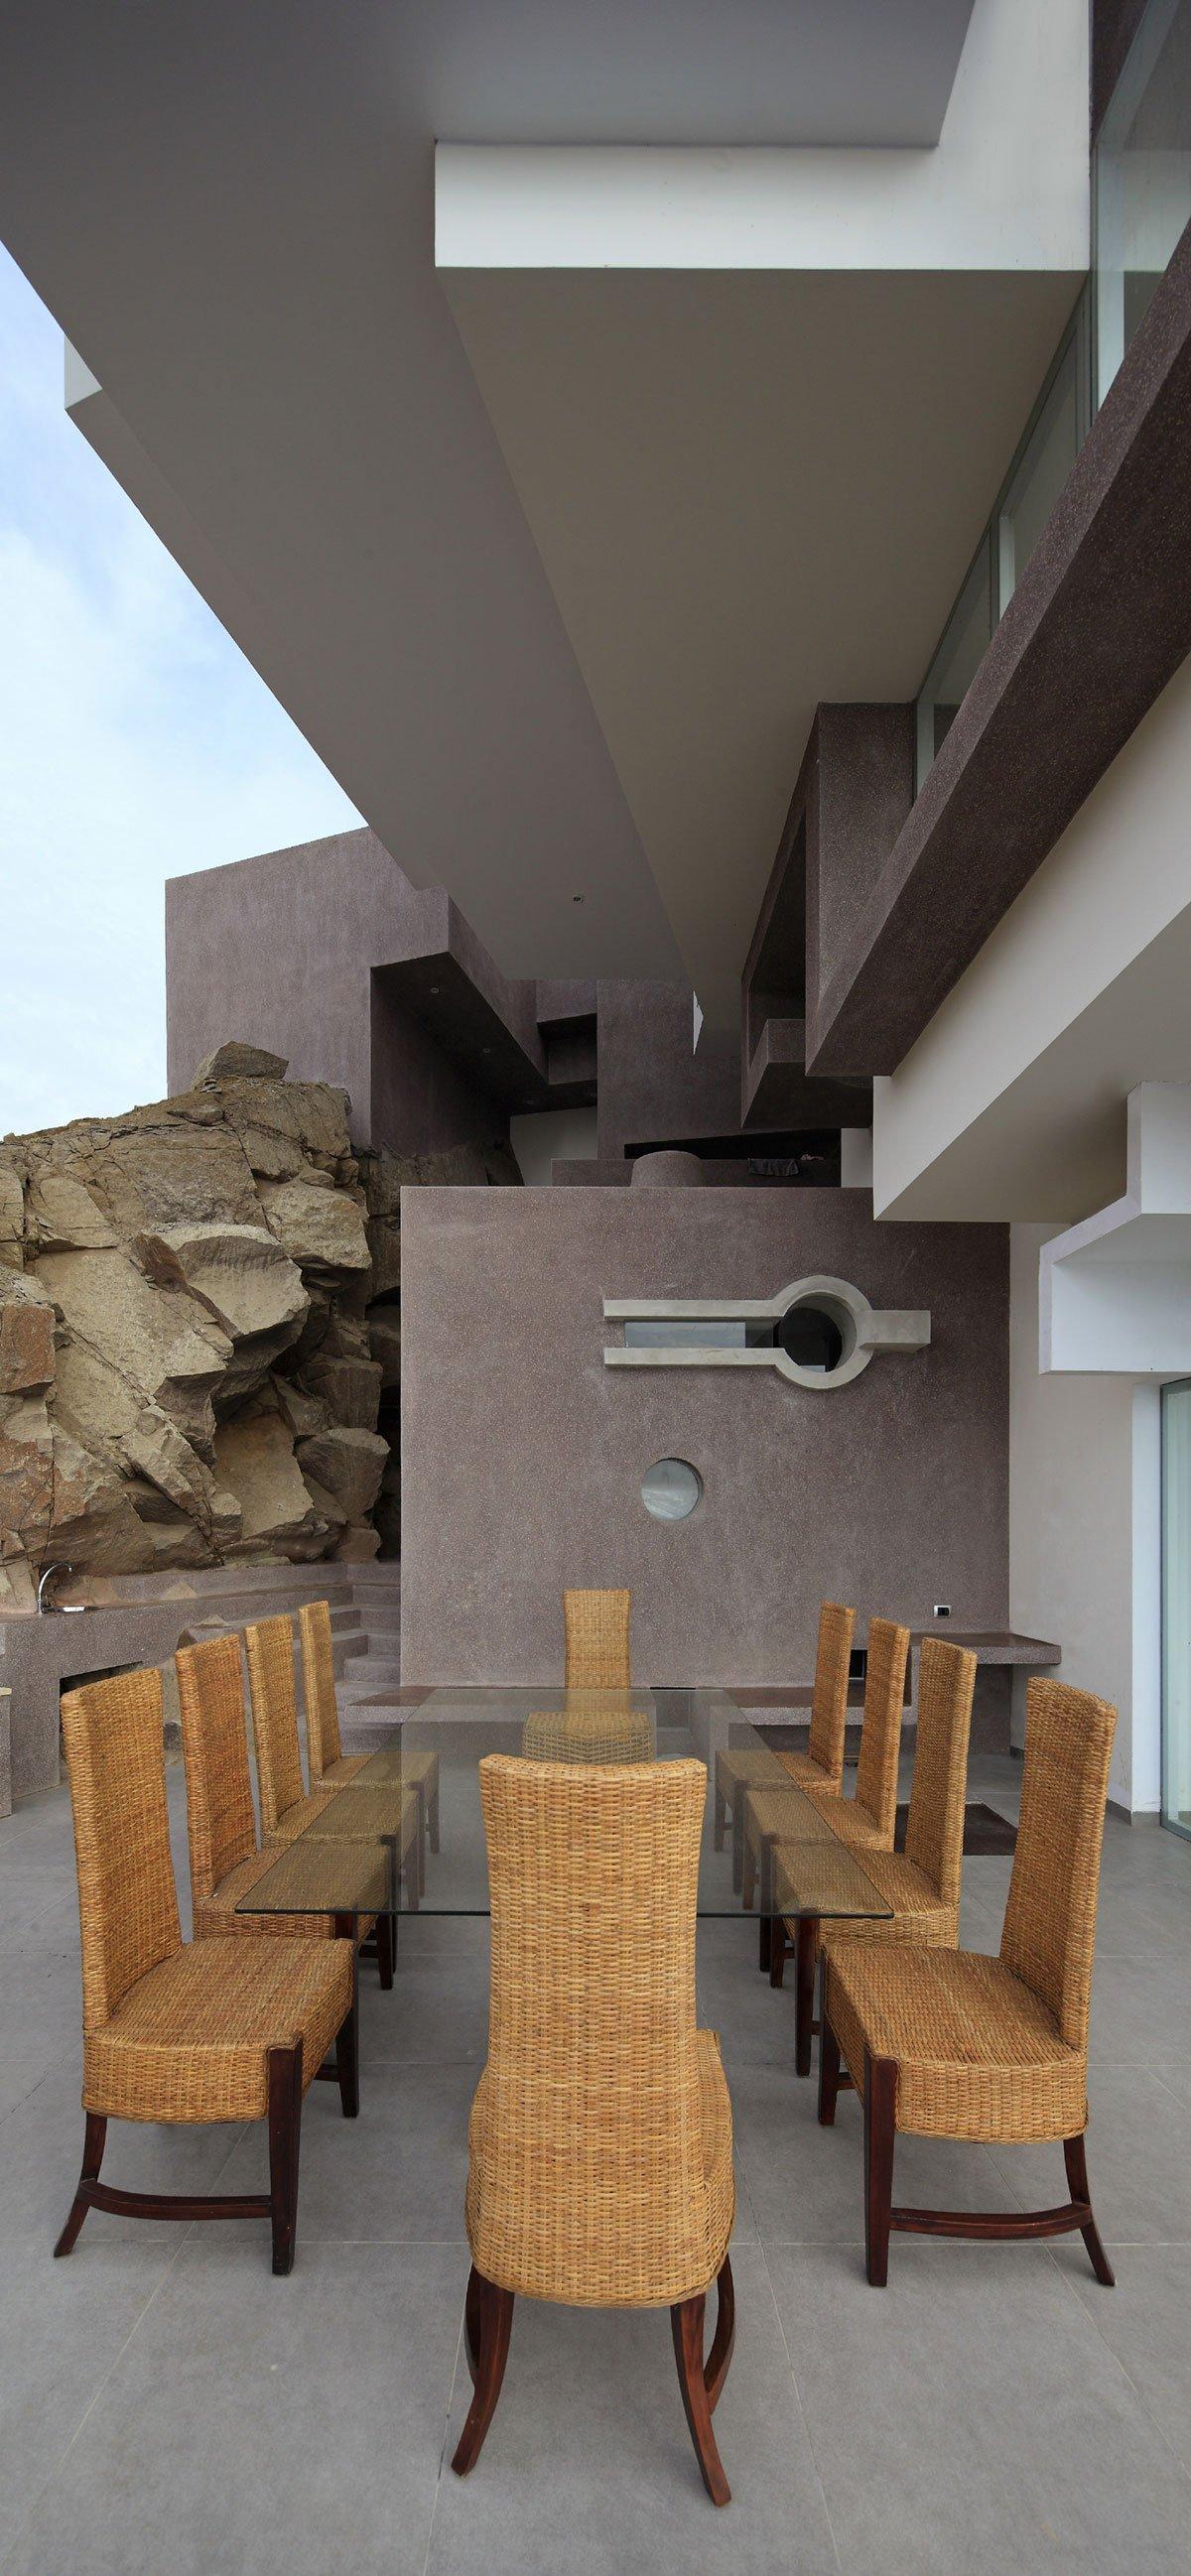 Veronica Beach, Longhi Architects, портфолио Longhi Architects, сложная архитектура частного дома, дом на берегу Тихого океана, особняк в Перу